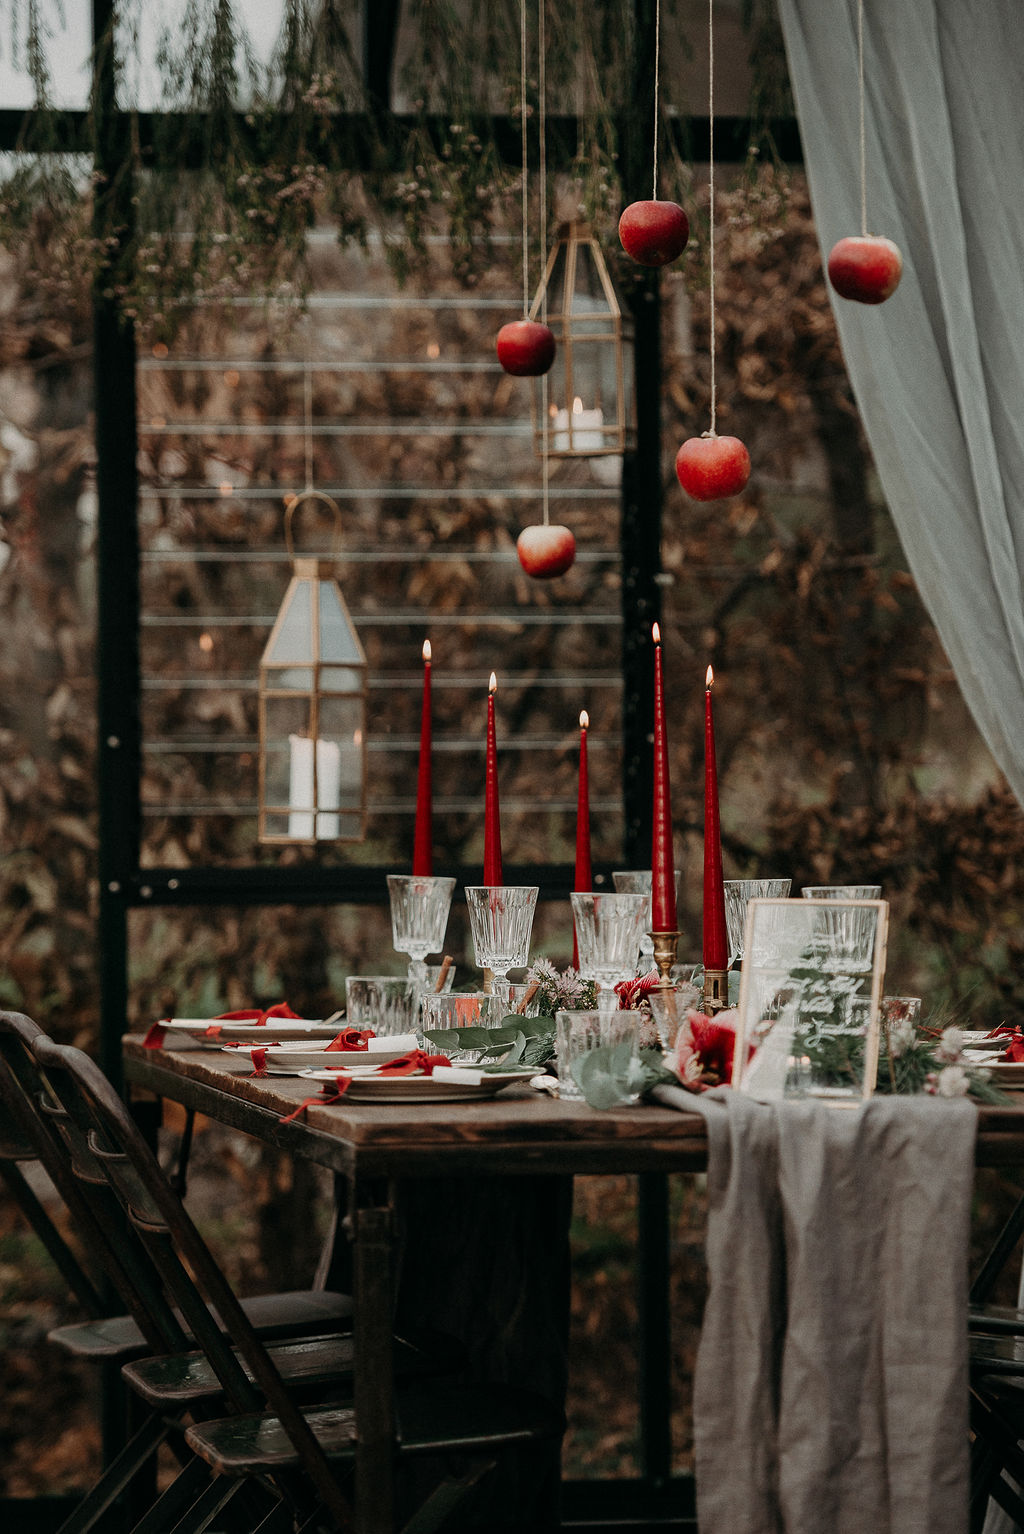 Julbröllop+vinterbröllop+dukning6.jpg